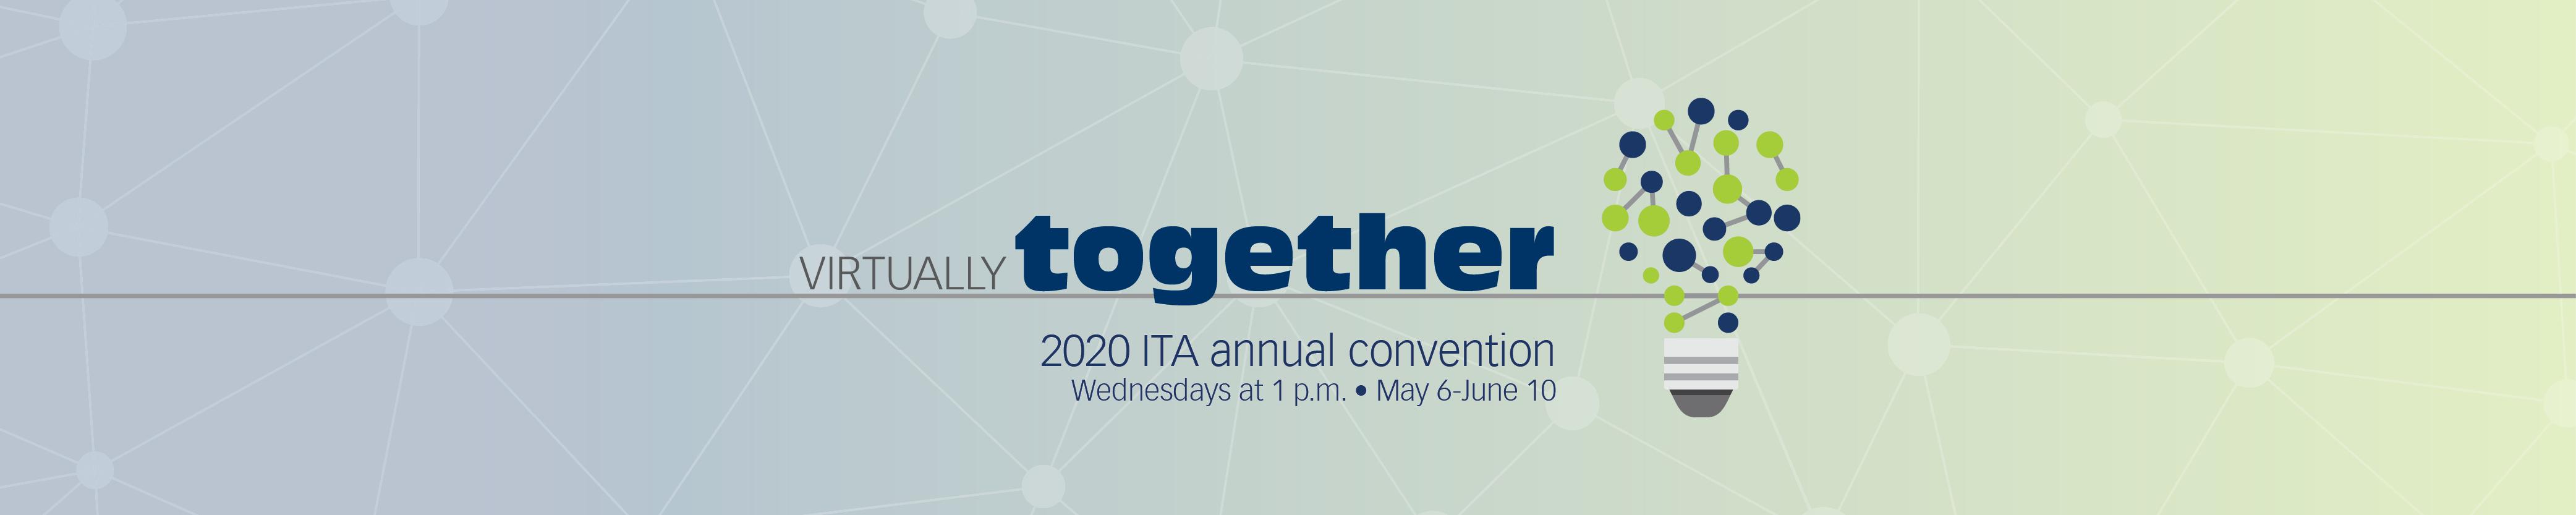 2020 ITA Virtual Conference Banner